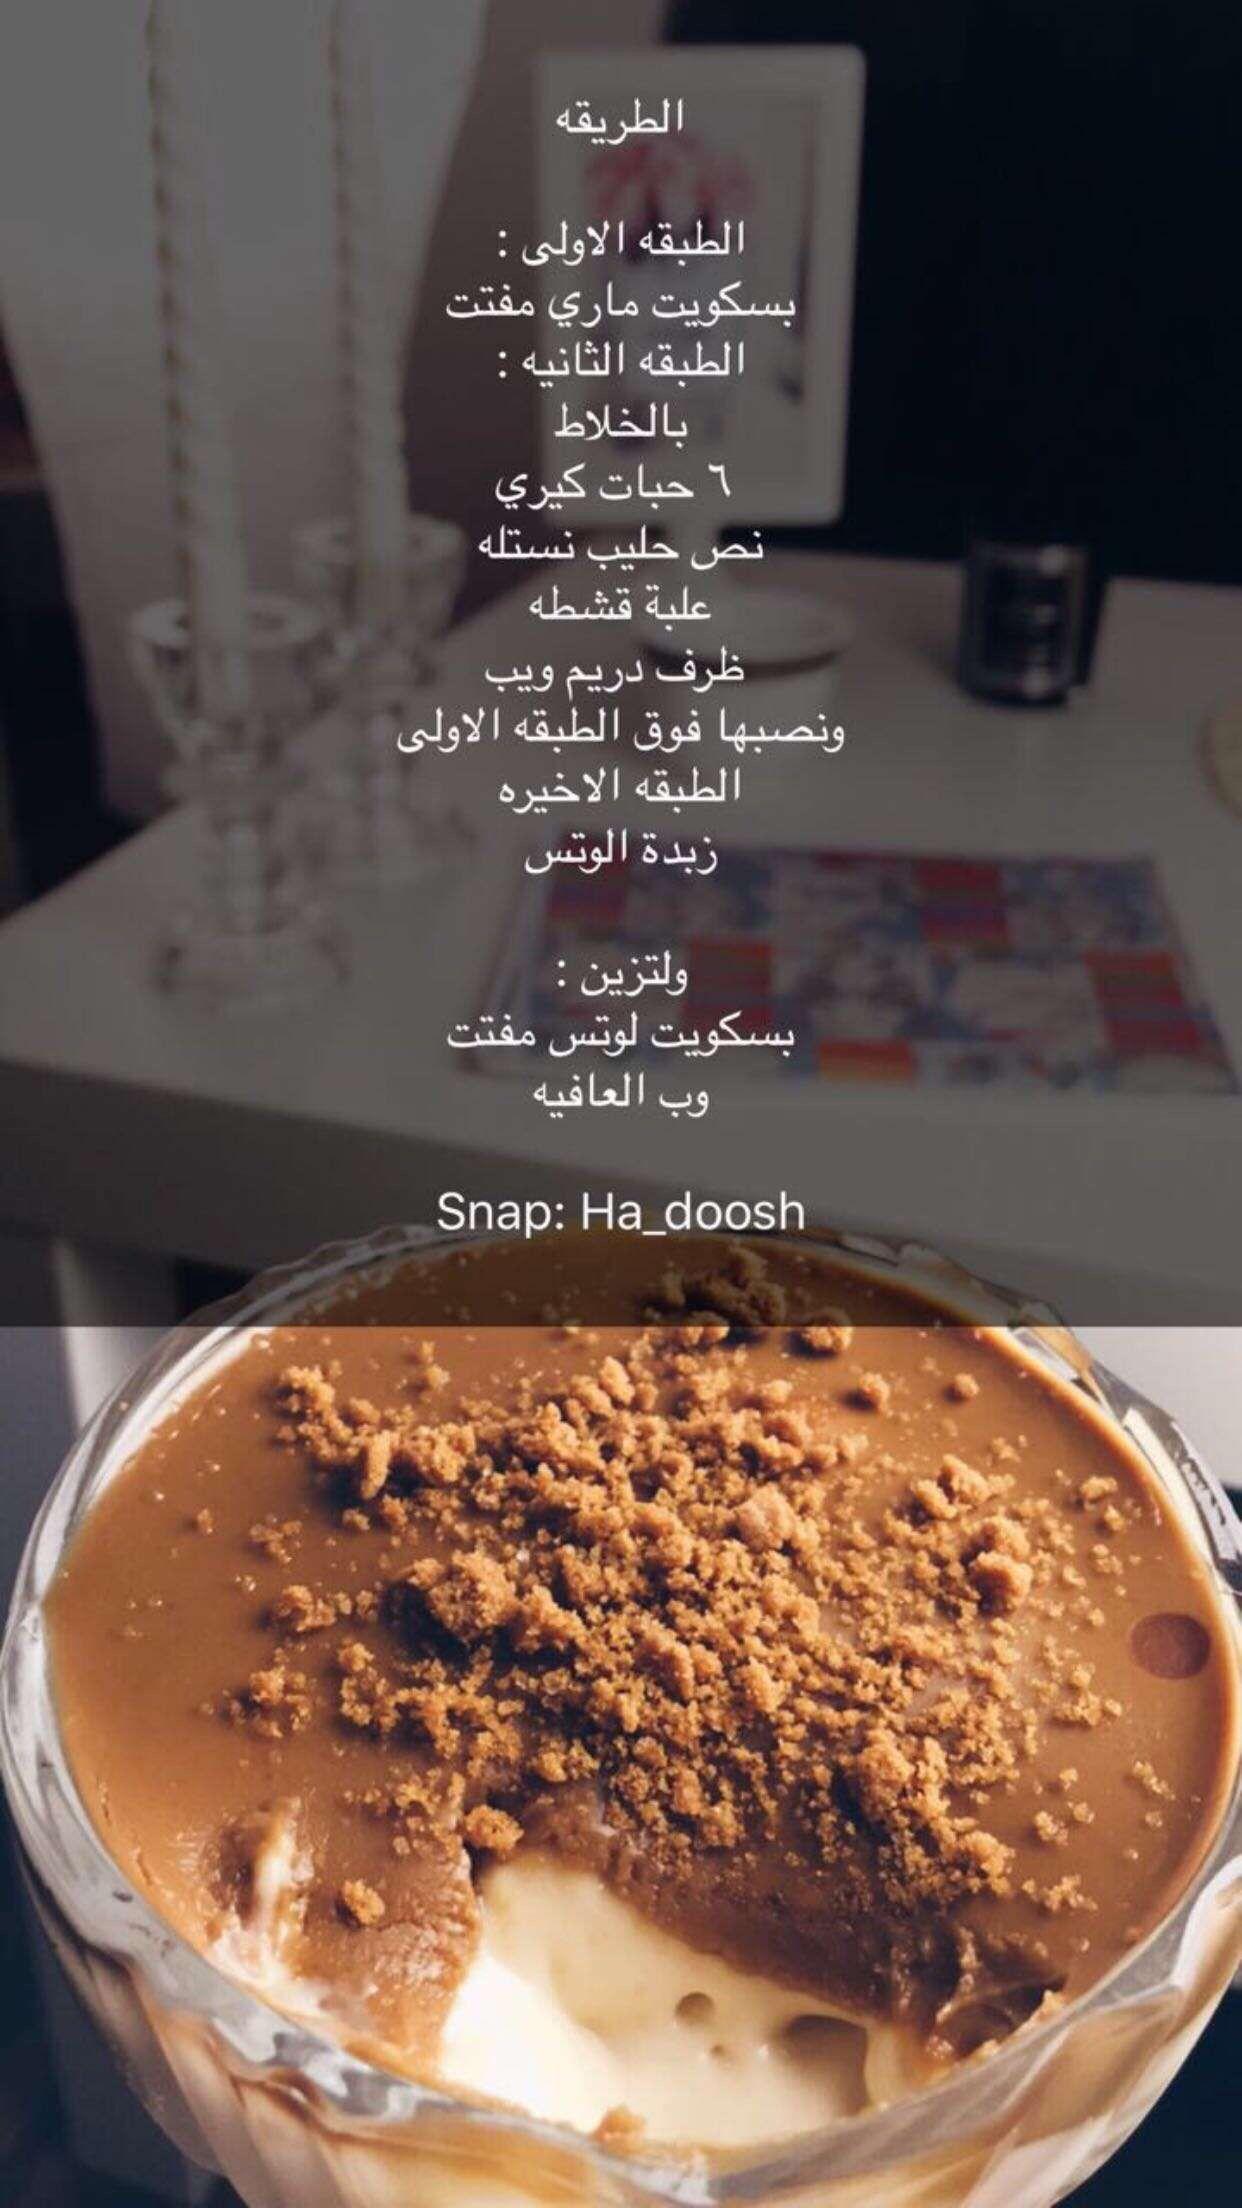 حلا لوتس Cooking Recipes Desserts Yummy Food Dessert Sweets Recipes